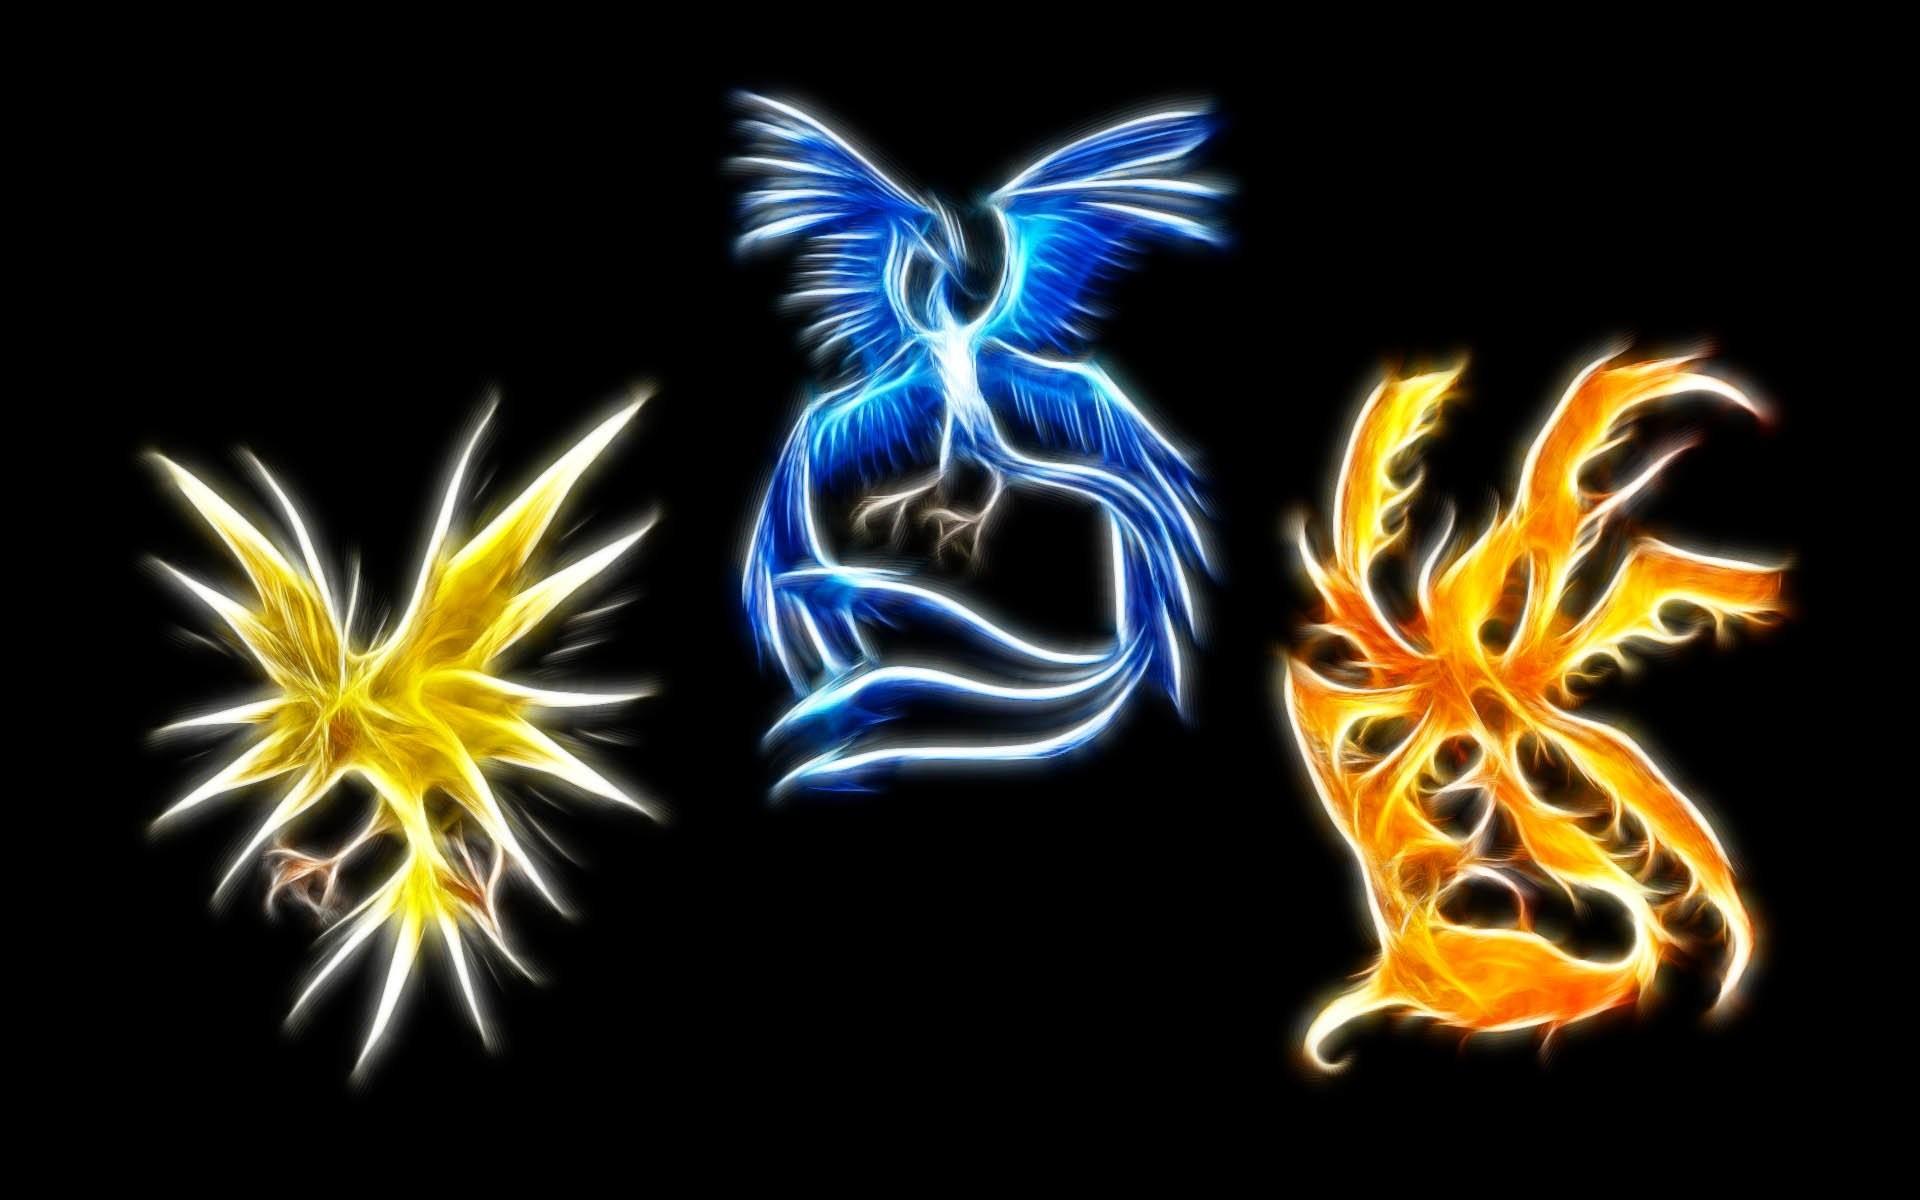 HD Wallpaper   Background ID:75412. Video Game Pokémon